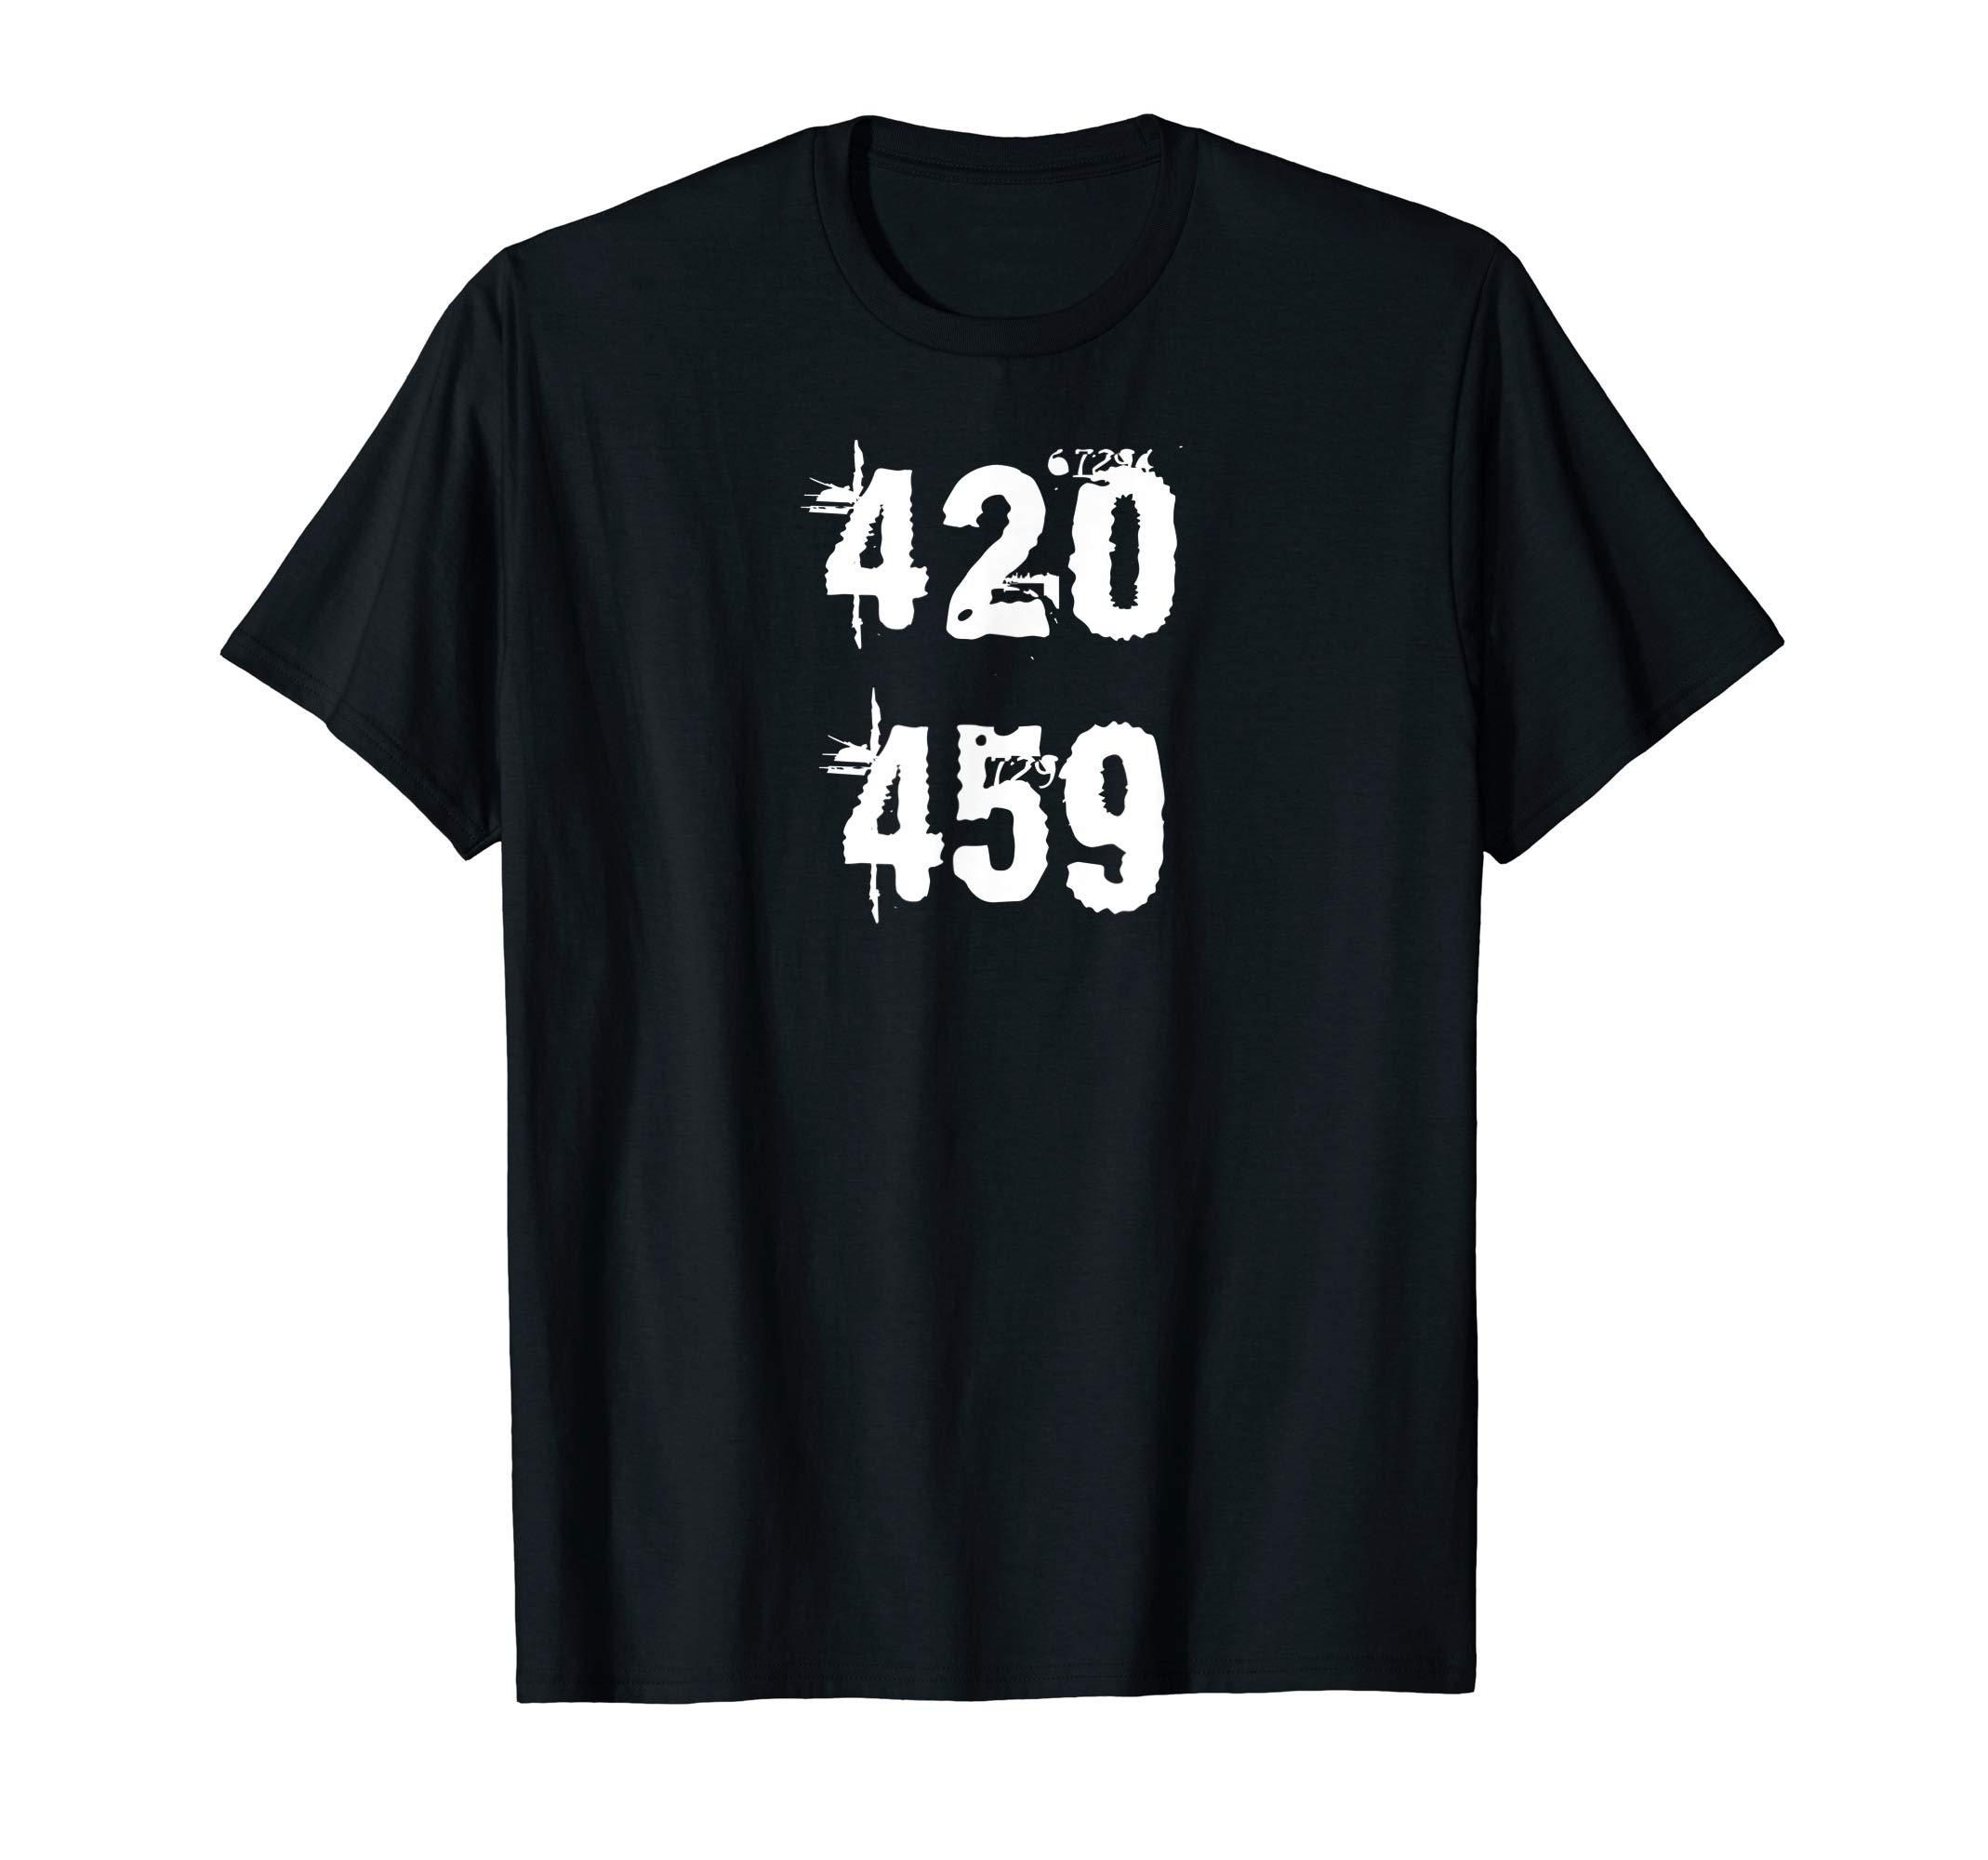 420 Cannabis I Love You Marijuana Love Design For Stoners T-Shirt